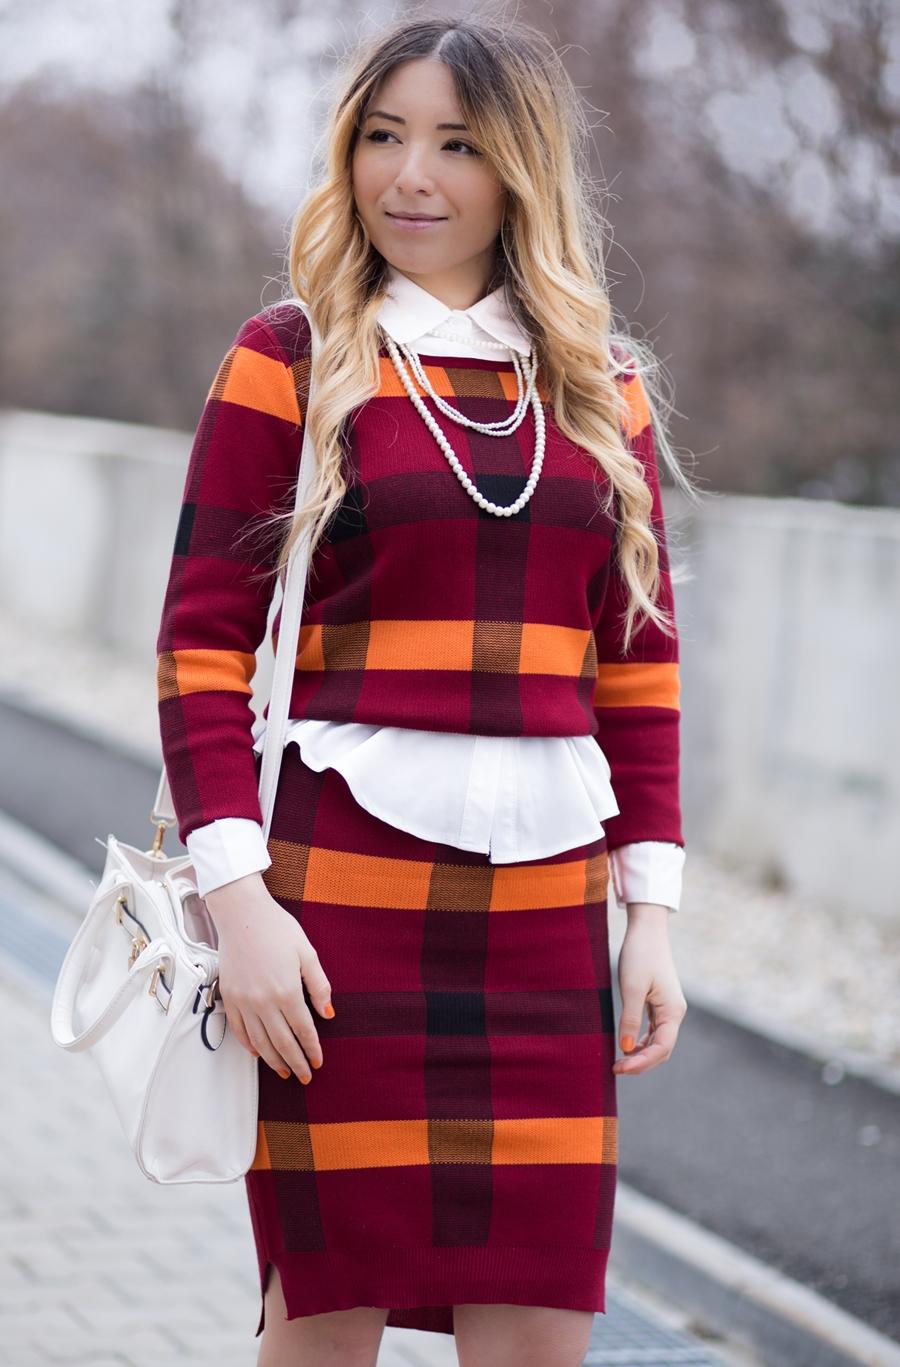 Andreea Ristea - stilul chic feminin